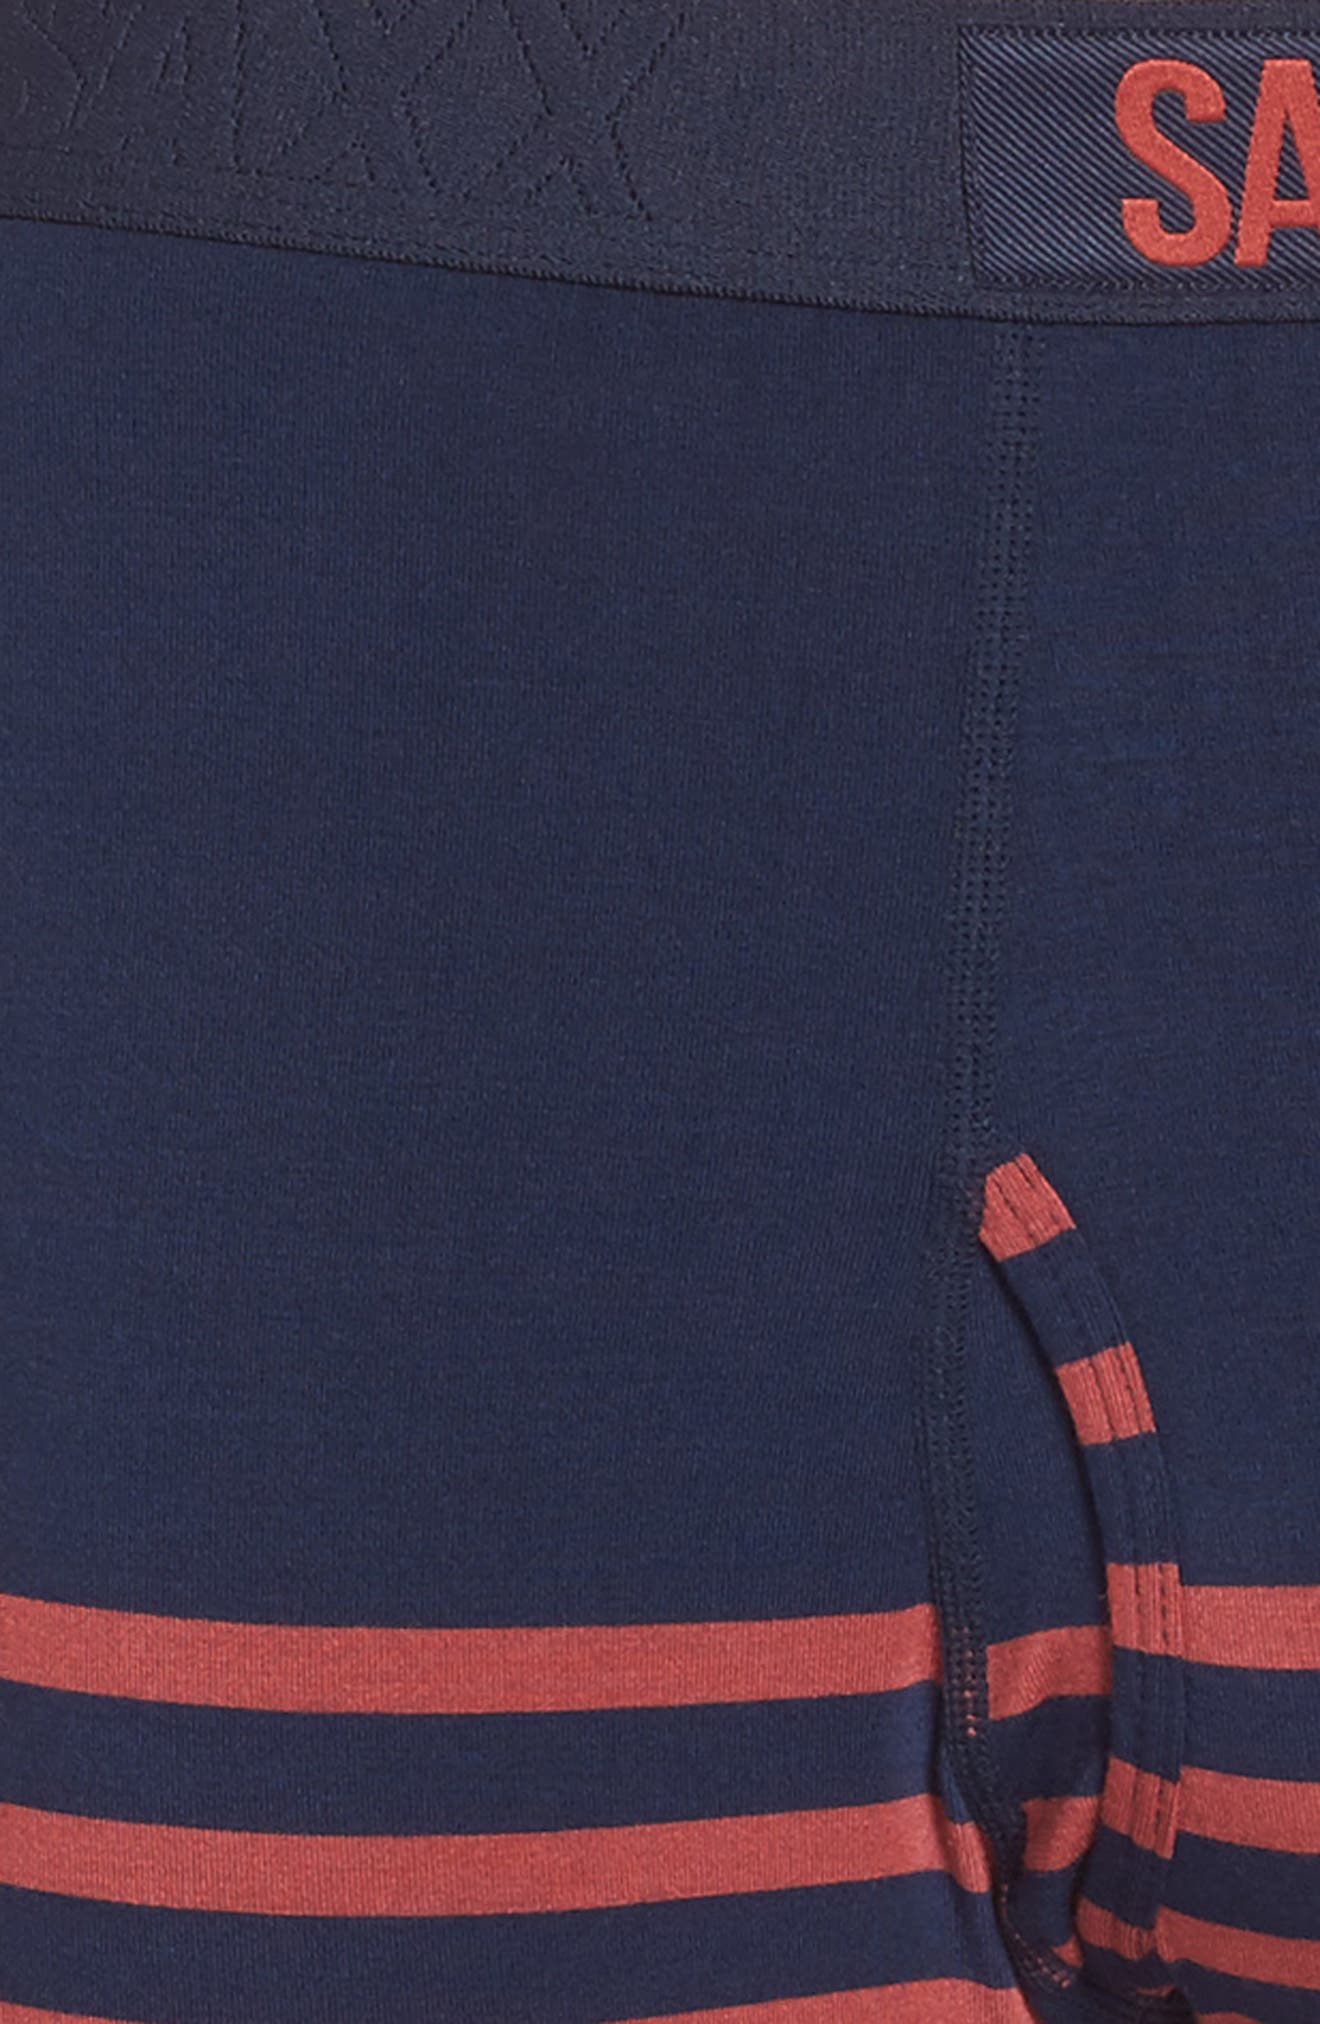 Ultra Boxer Briefs,                             Alternate thumbnail 4, color,                             Sailor Stripe